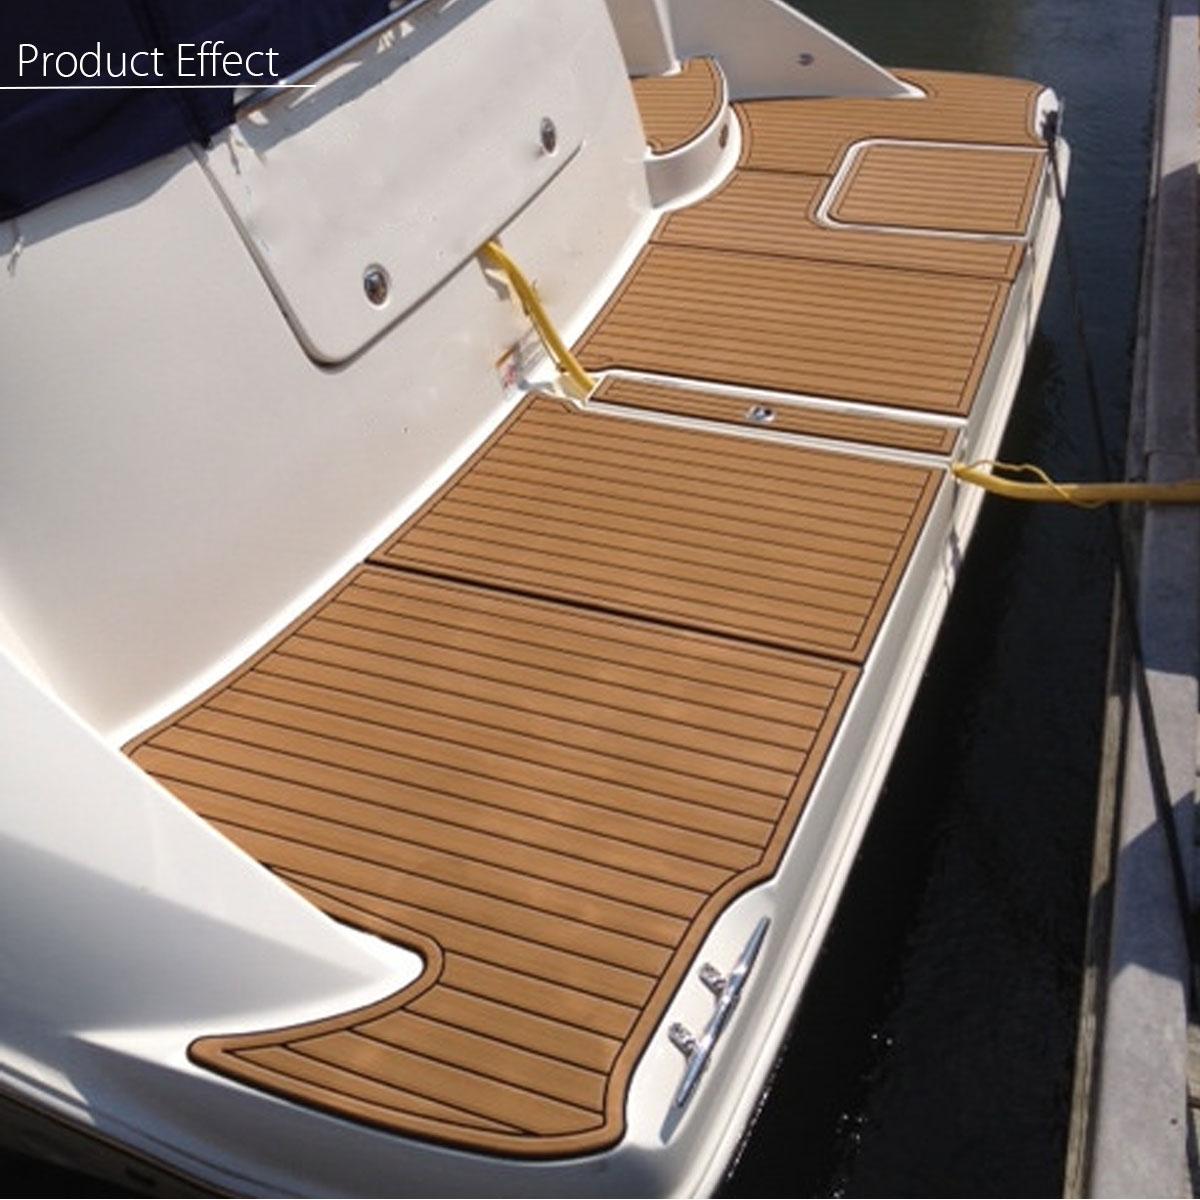 EVA Foam Faux Teak Sheet Self Adhesive Boat Yacht Synthetic Teak Floor Mat RV Parts With Glue Black and Gold 230cm x 90cm x 5mm teak house ваза ingrid